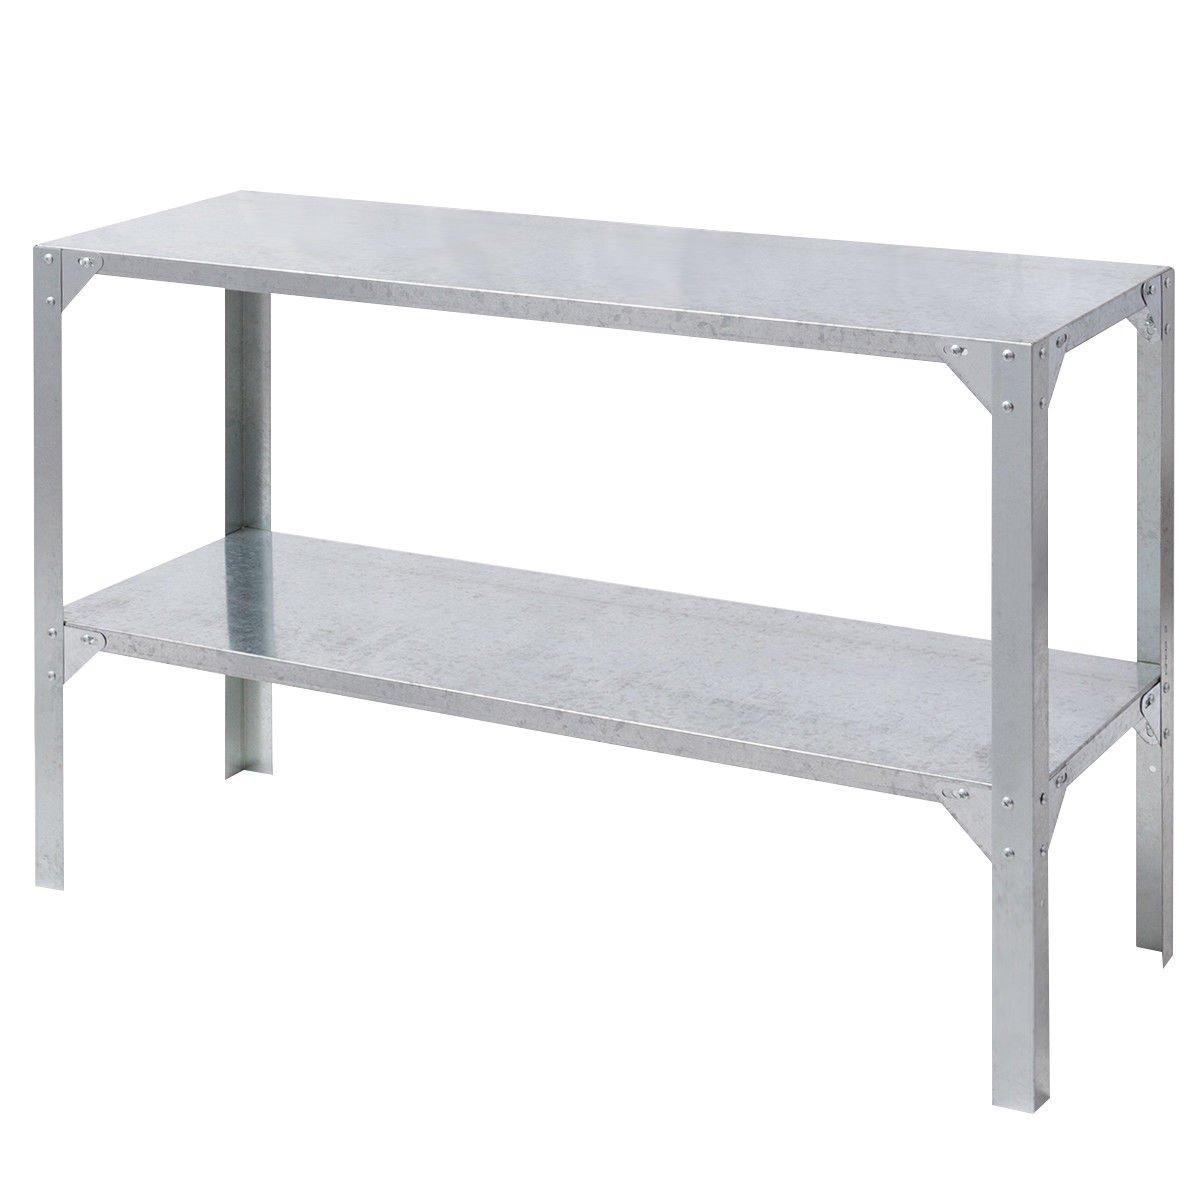 Surprising Amazon Com Potting Table Storage Shelves Galvanized Steel Creativecarmelina Interior Chair Design Creativecarmelinacom